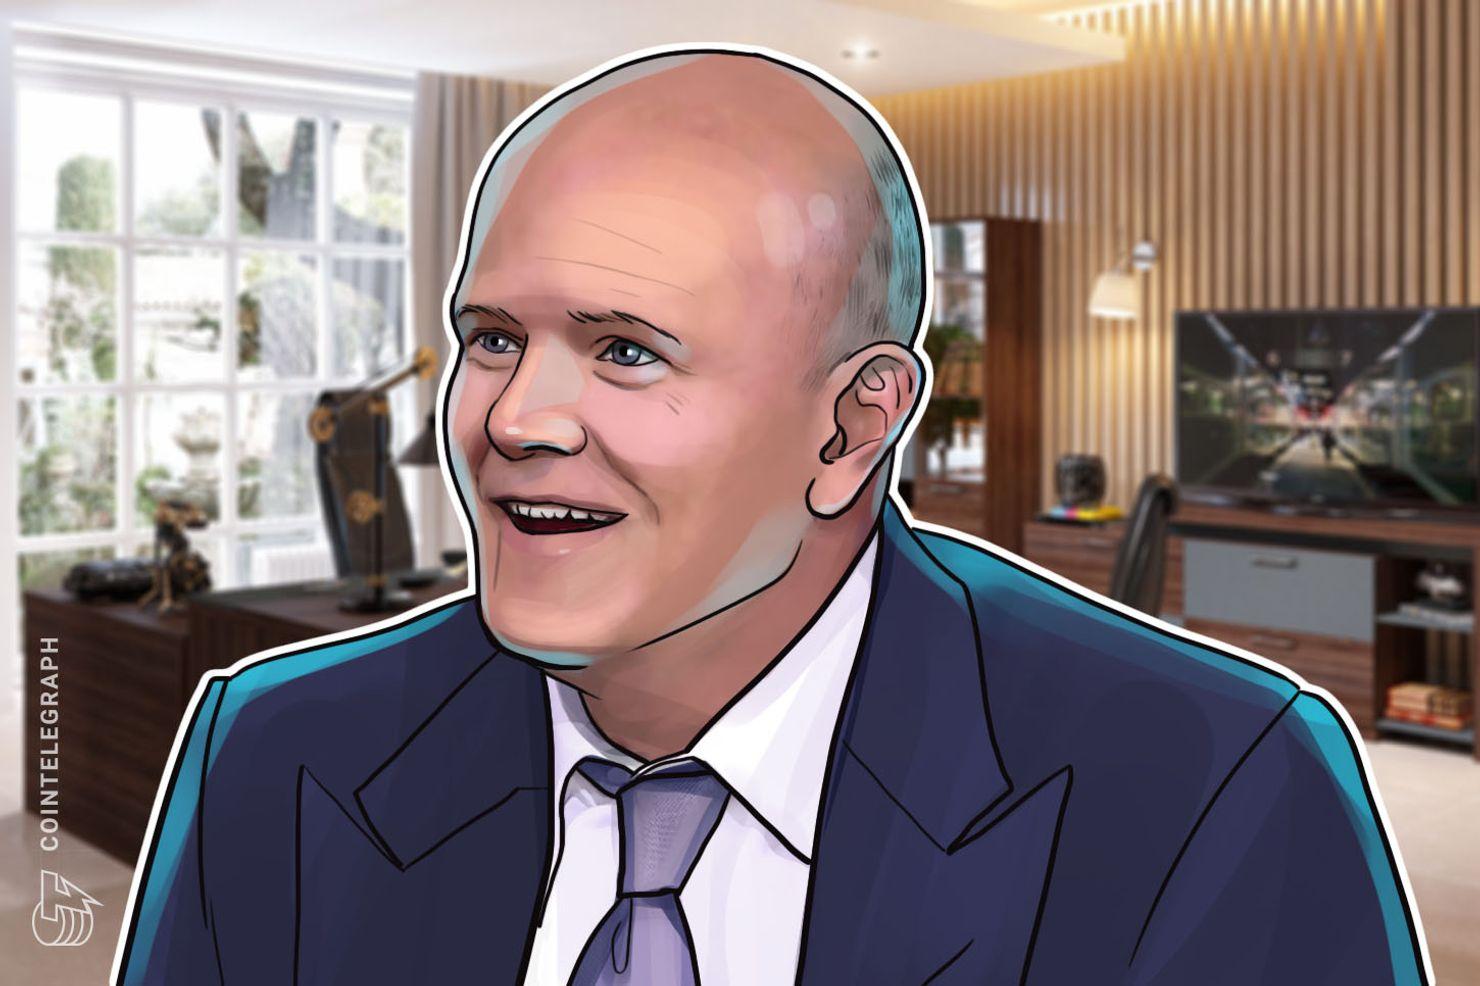 Galaxy Digital's Mike Novogratz: Cryptocurrency Markets Will 'Flip Next Year'